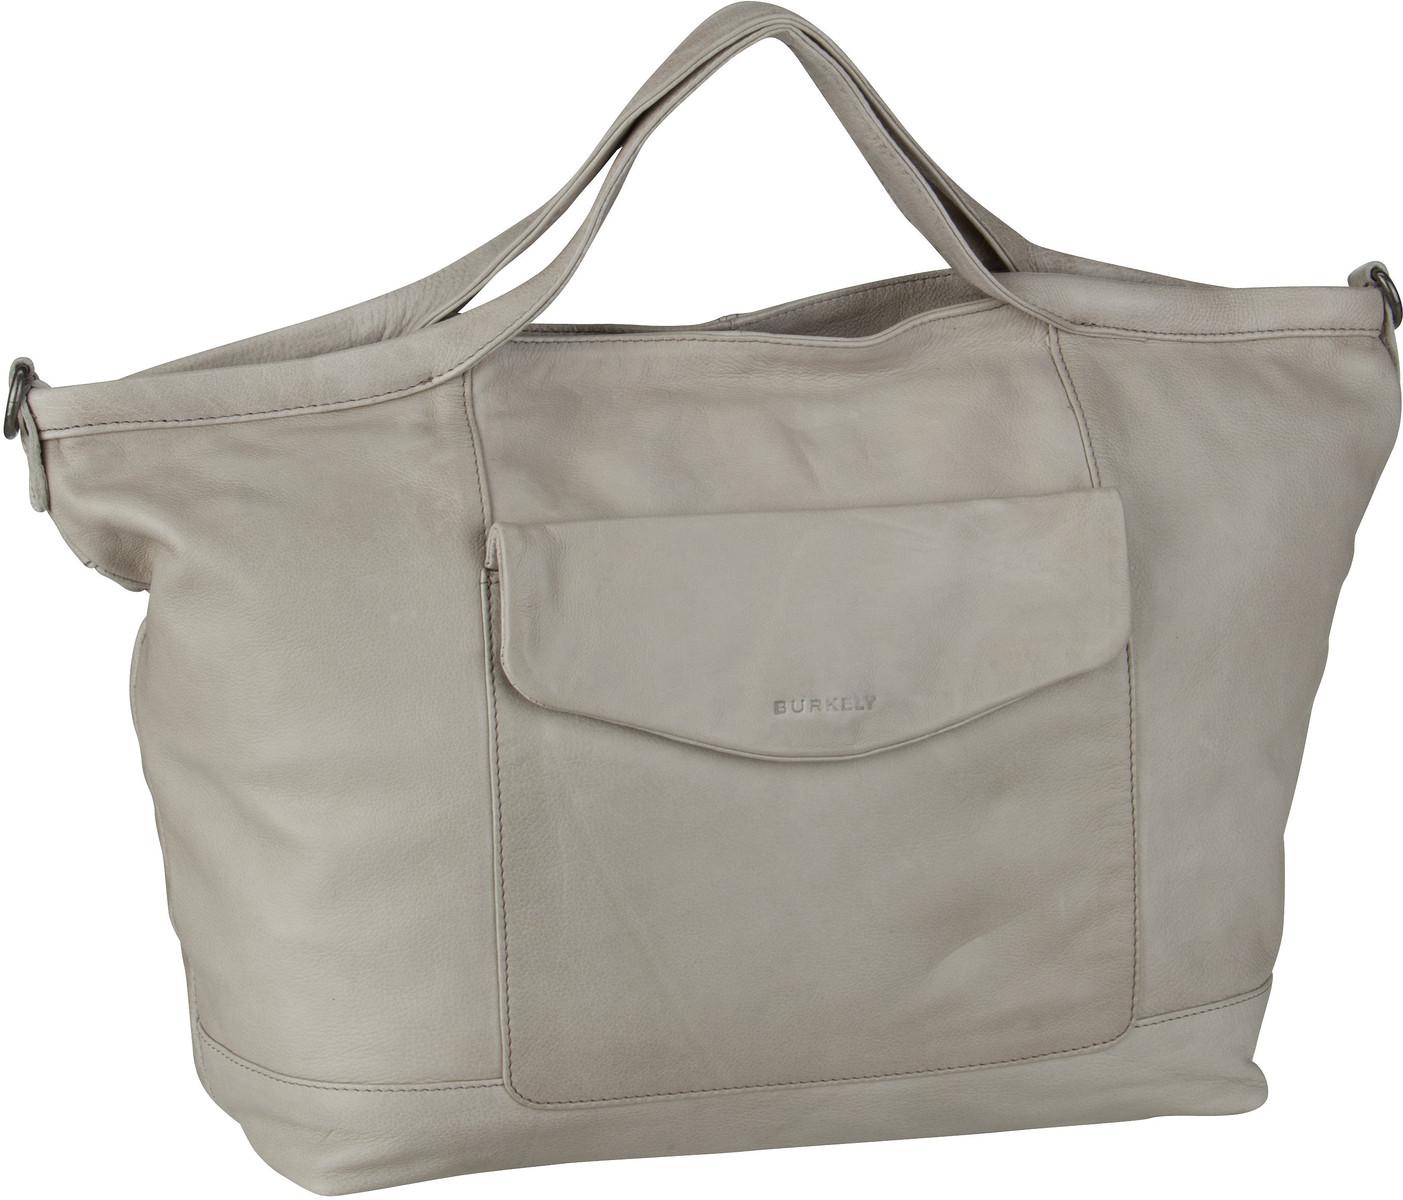 Burkely Handtasche Just Jackie Wide Shopper 2284 Light Grey